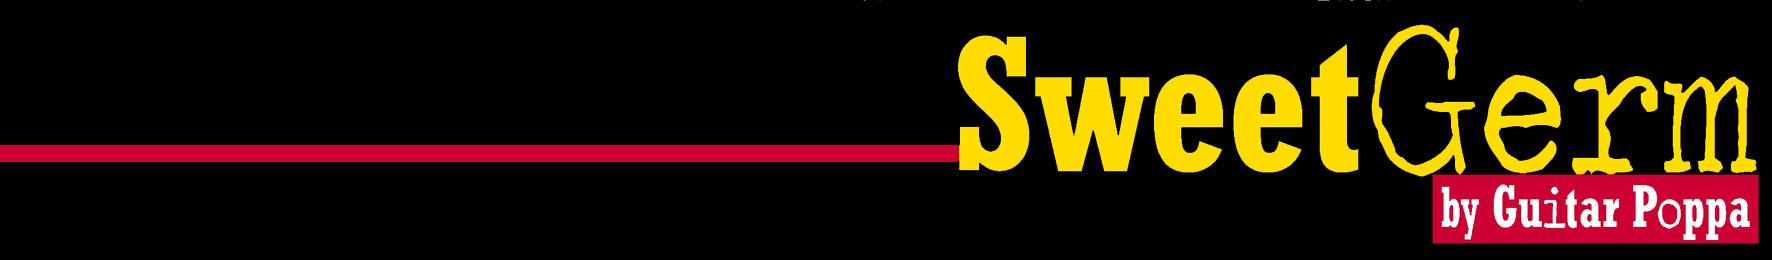 Produits - SweetGerm _logo produit L15x300dpi